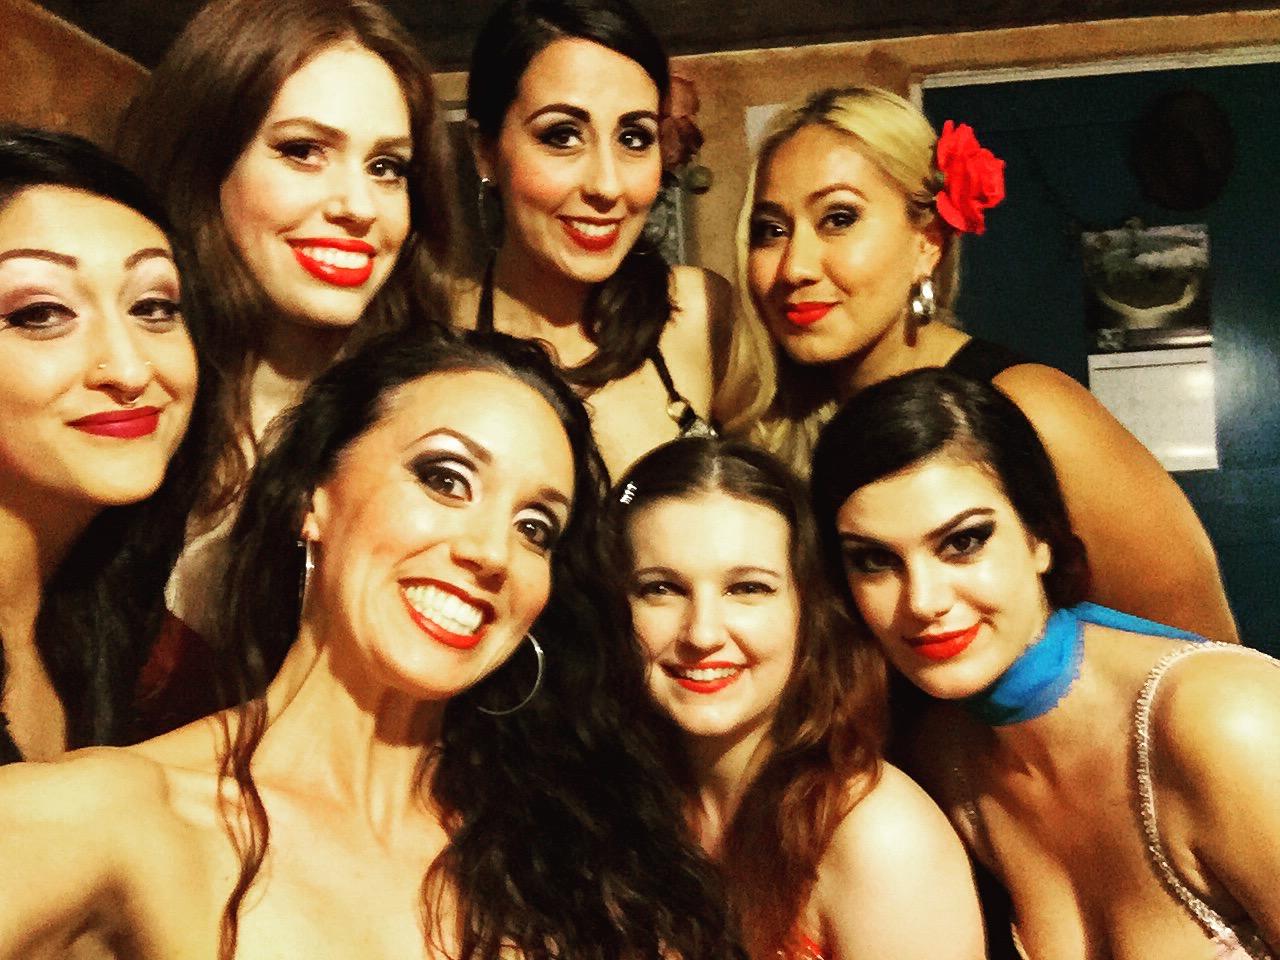 Raqs Artist Project graduates April 2016~ Alia Gamal, Eden Lighthipe, Cathy, Yuliya Lunessia, Belen Garibaldi, and Shirin